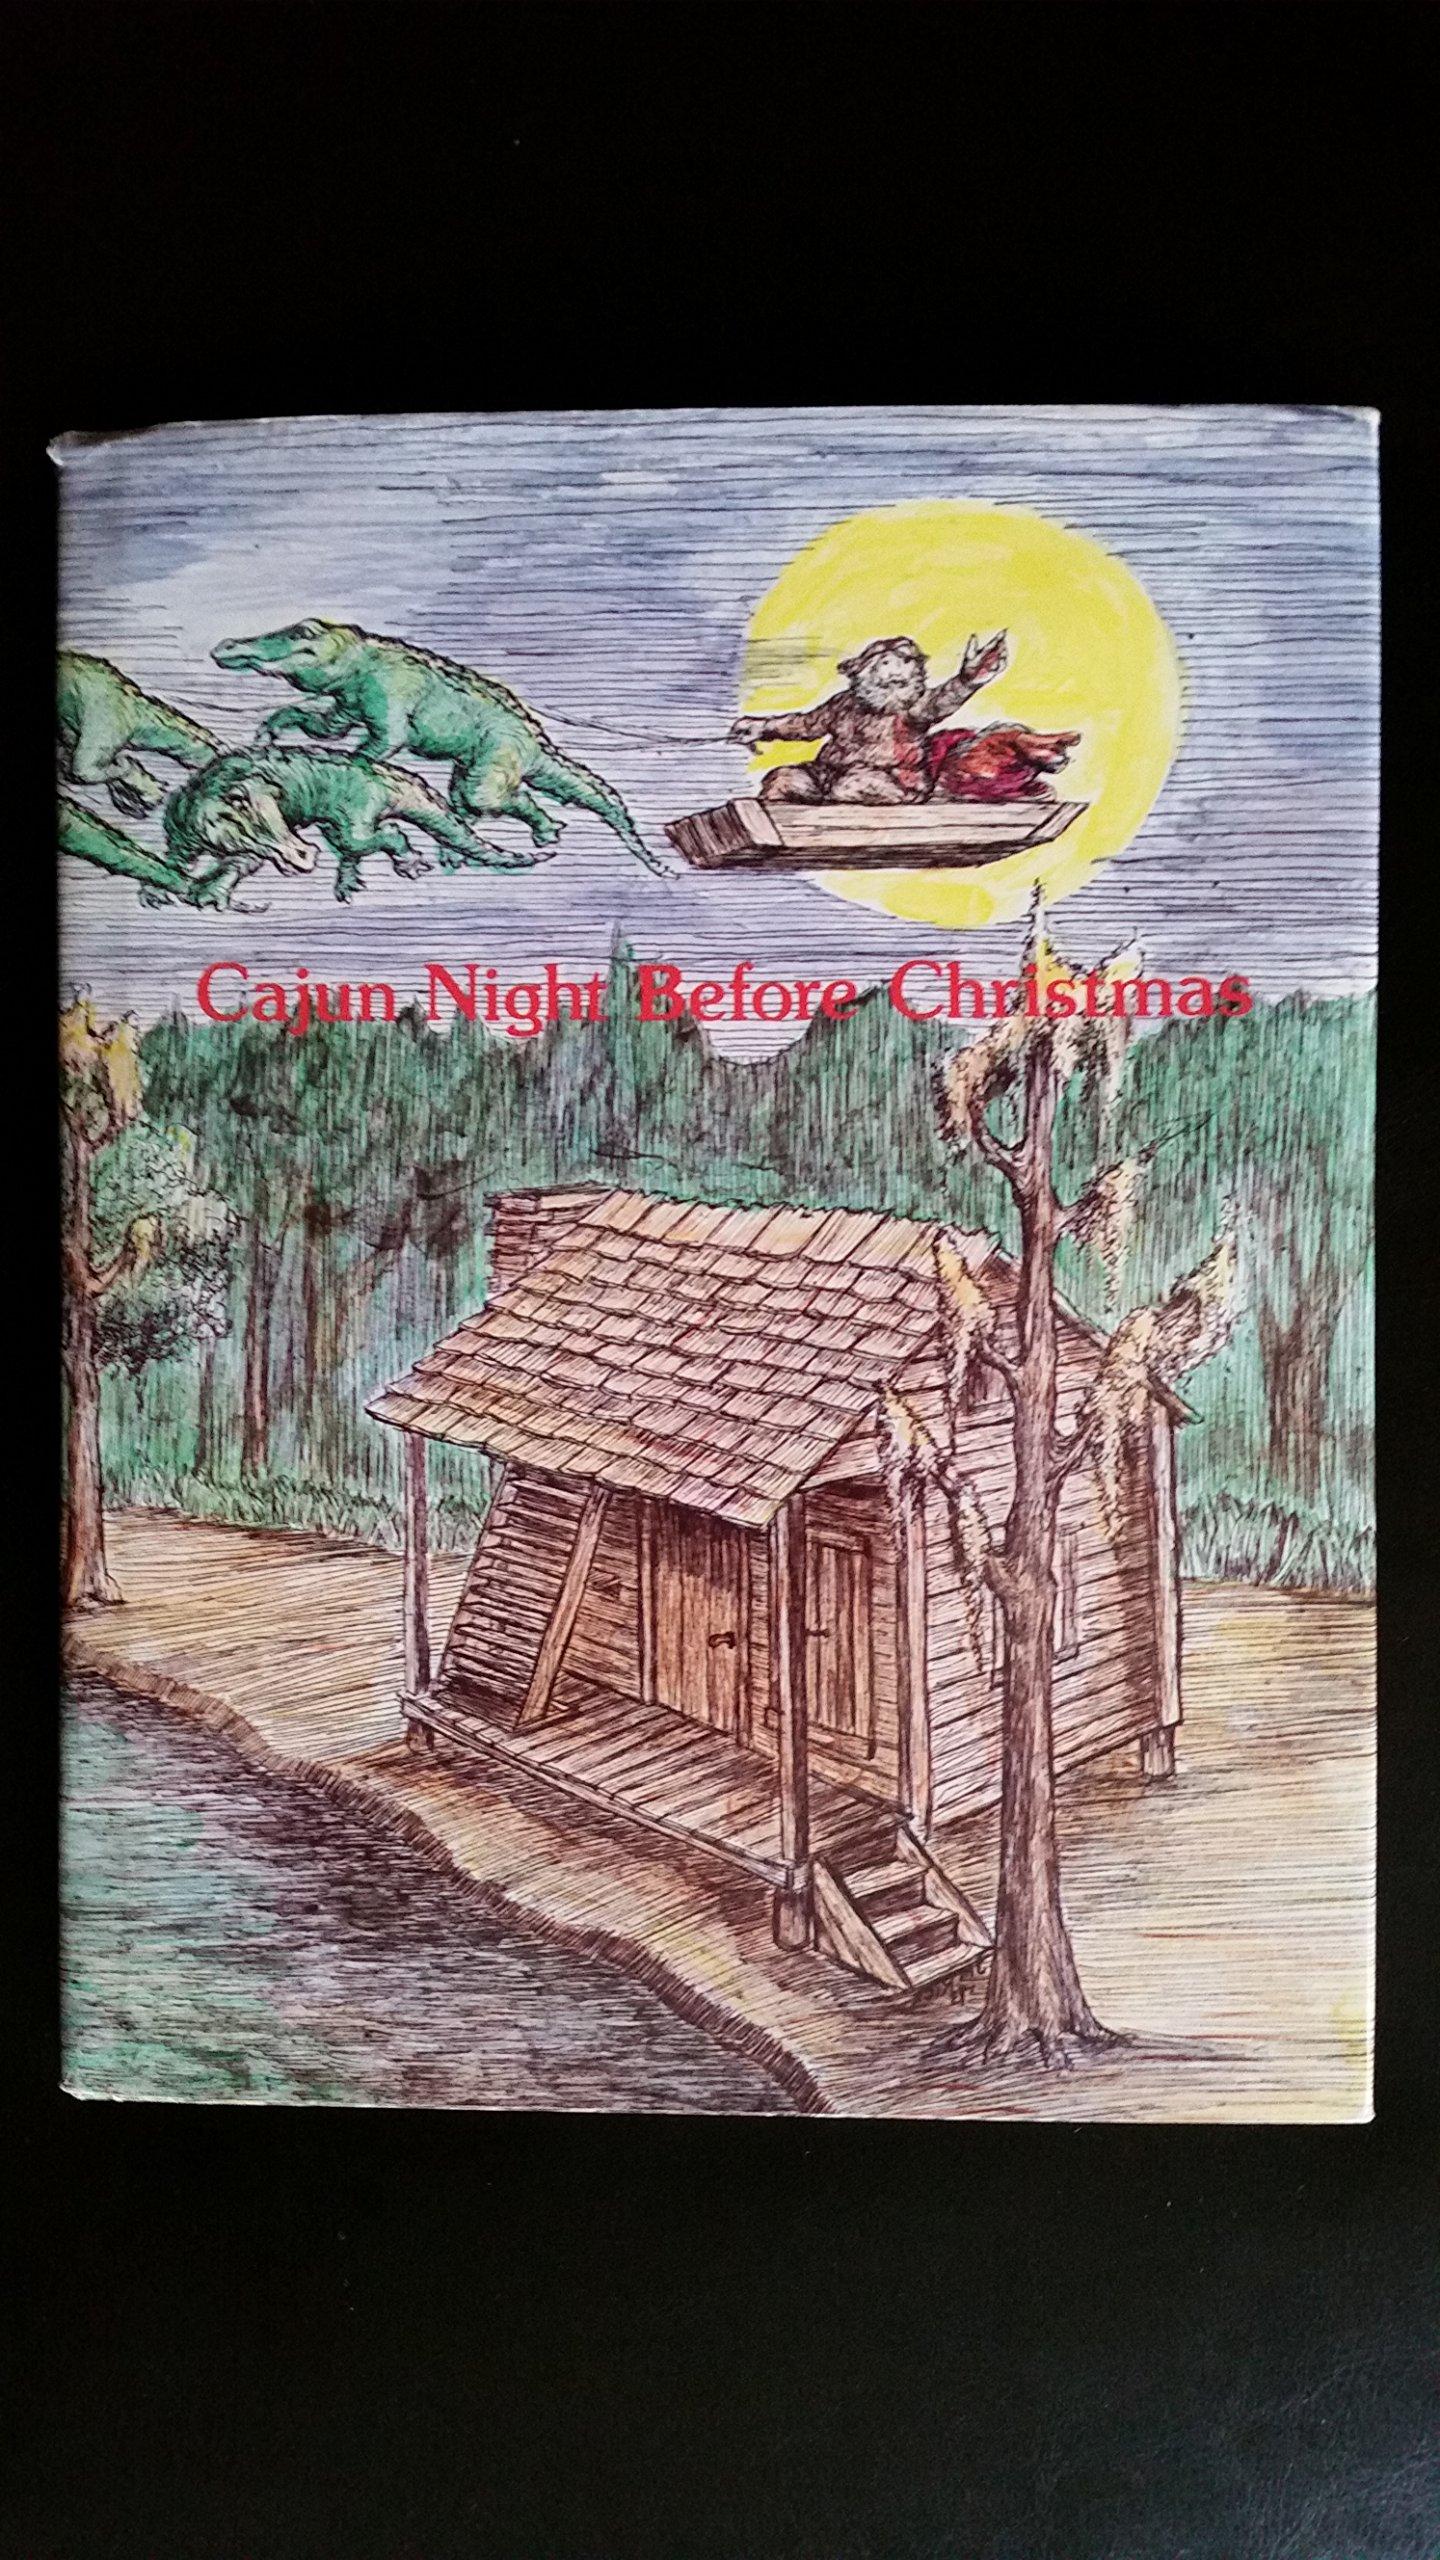 Cajun Night Before Christmas: Trosclair: Amazon.com: Books